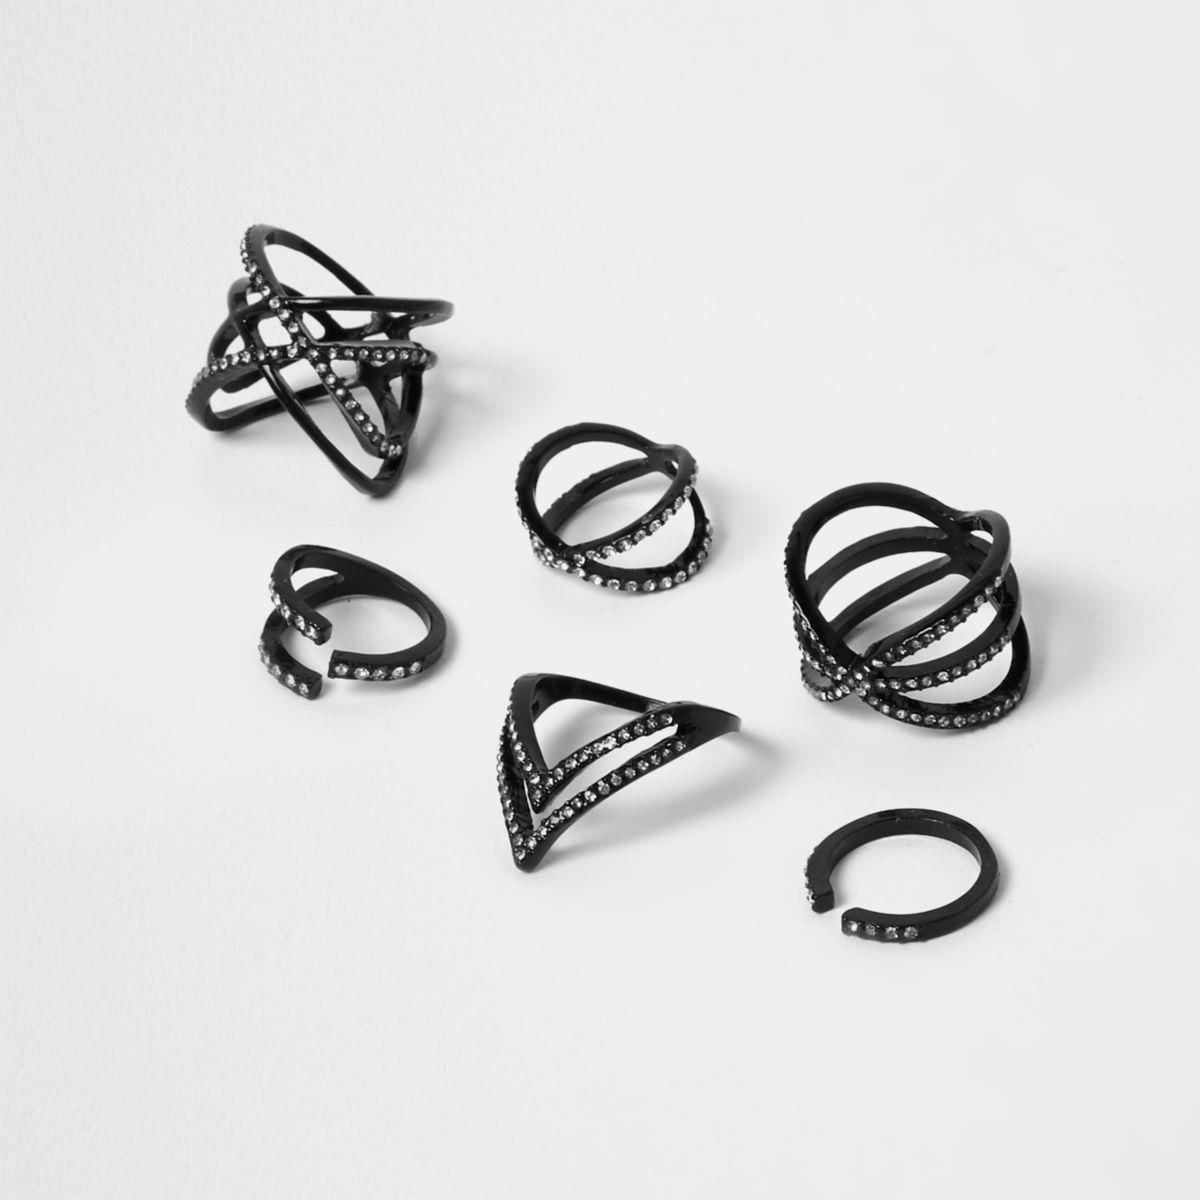 Black diamante encrusted ring pack